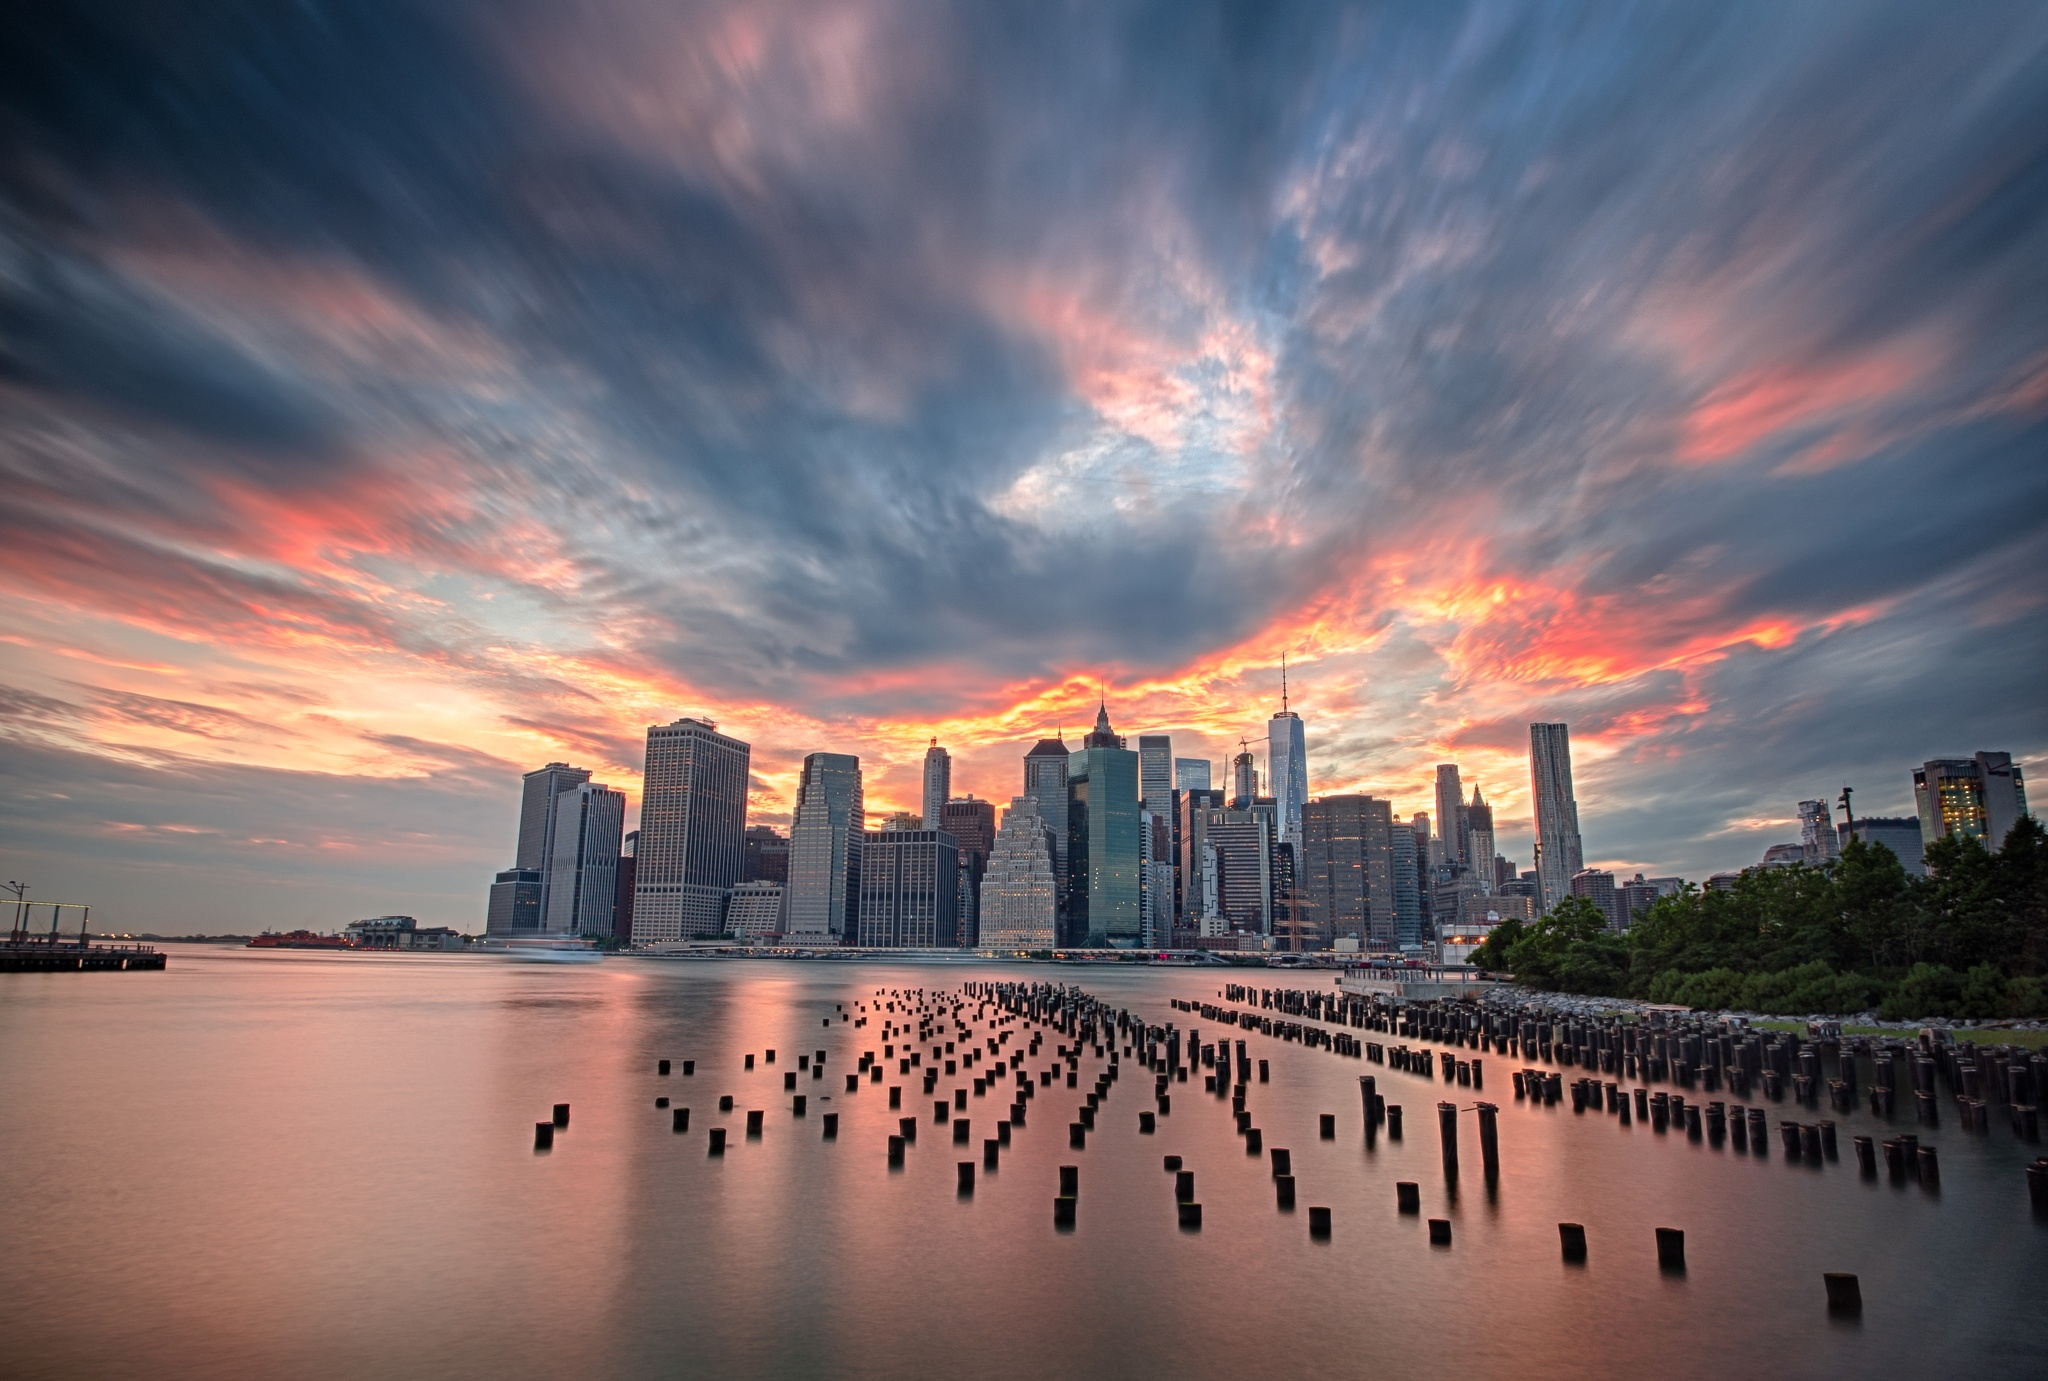 Burning Sunset over Manhattan by Raf Winterpacht